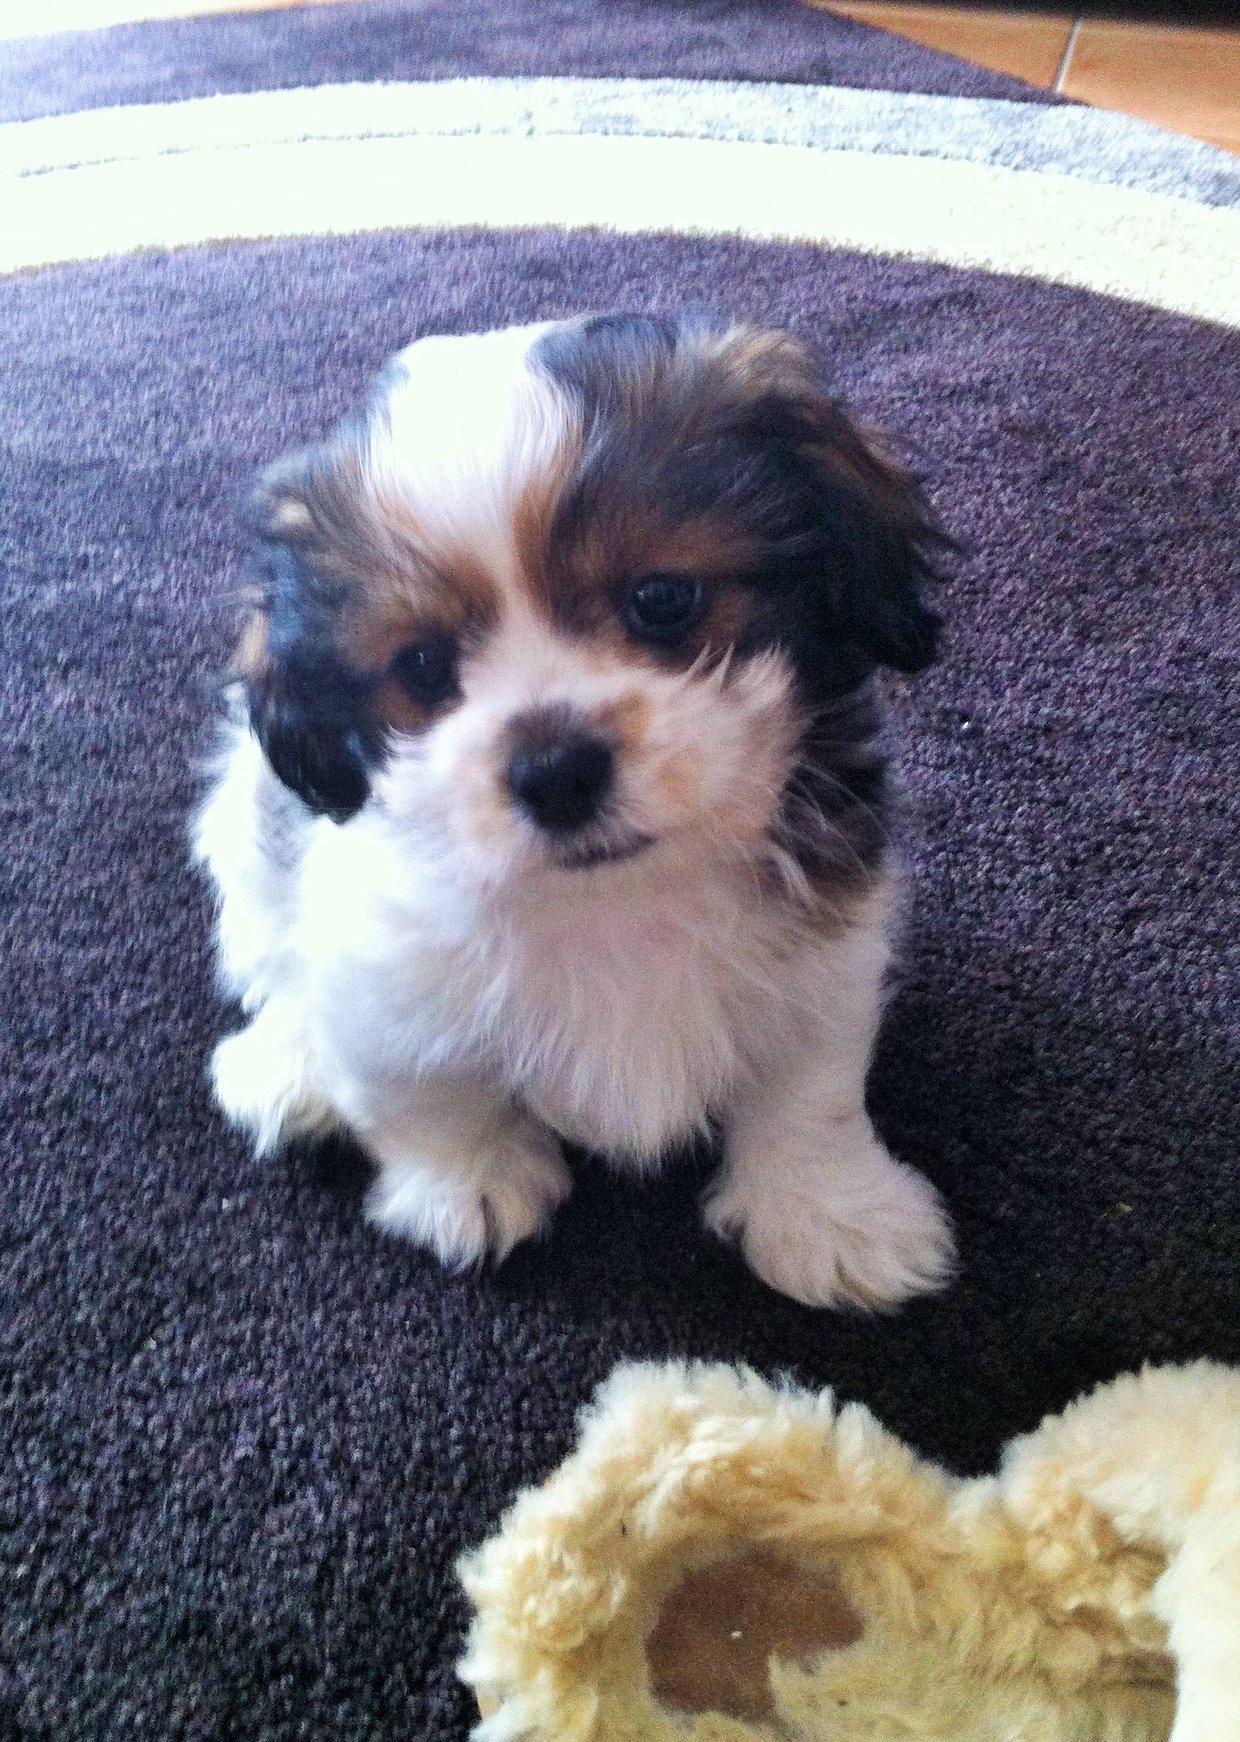 Maltese X Shih Tzu My Puppy Max